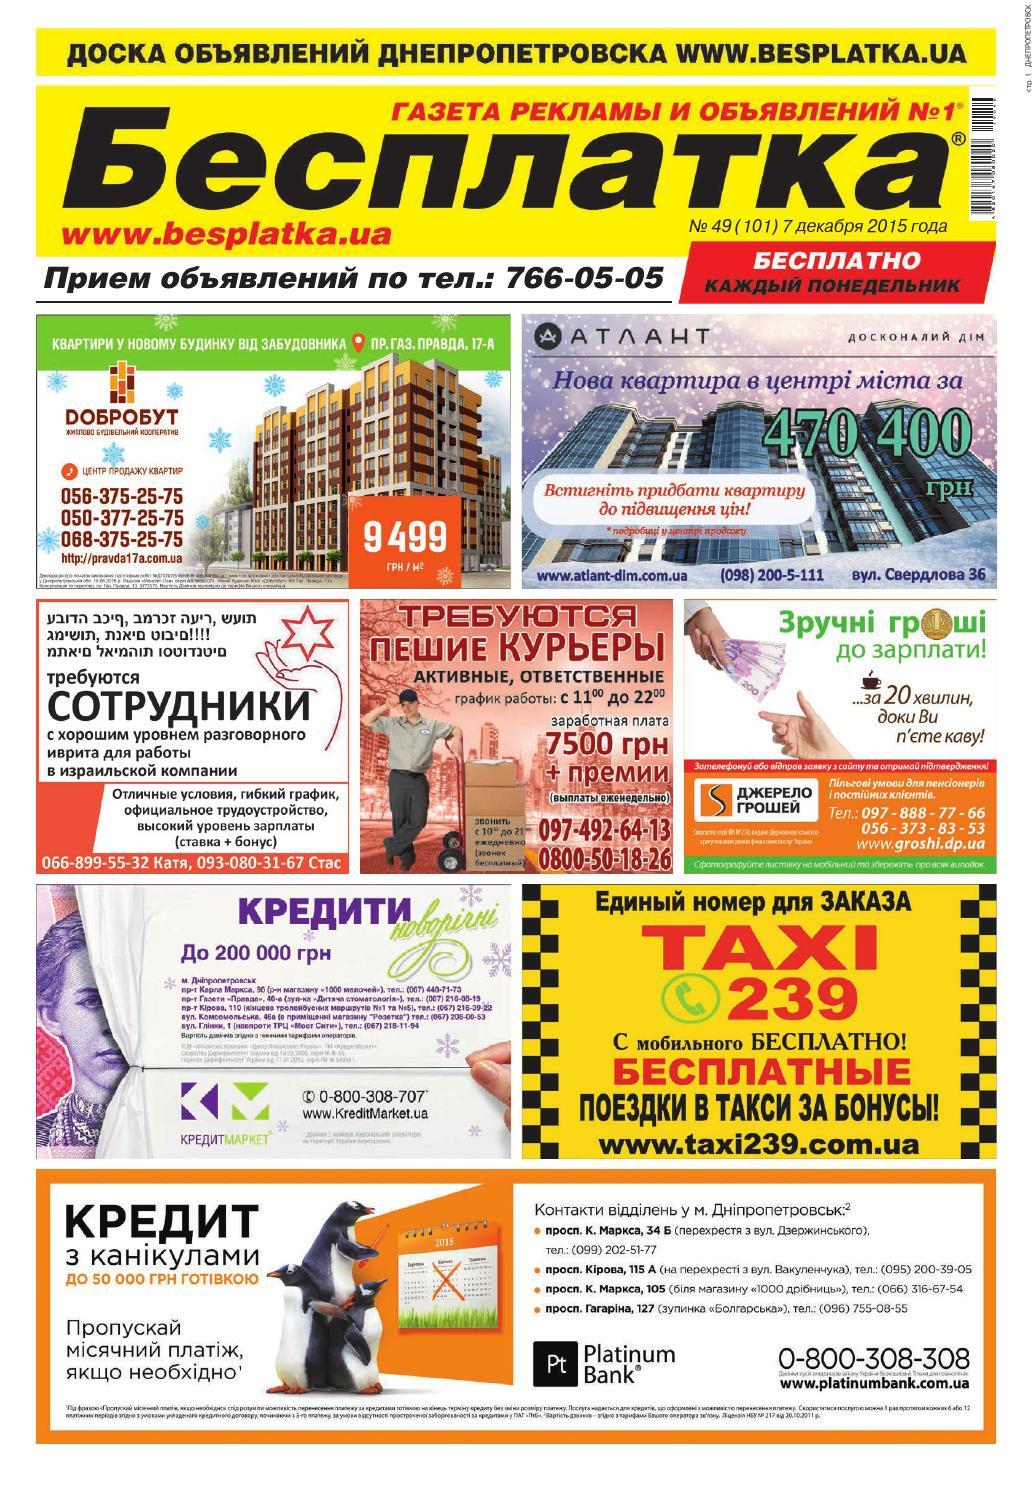 daca3f0e68eb Besplatka #49 Днепропетровск by besplatka ukraine - issuu